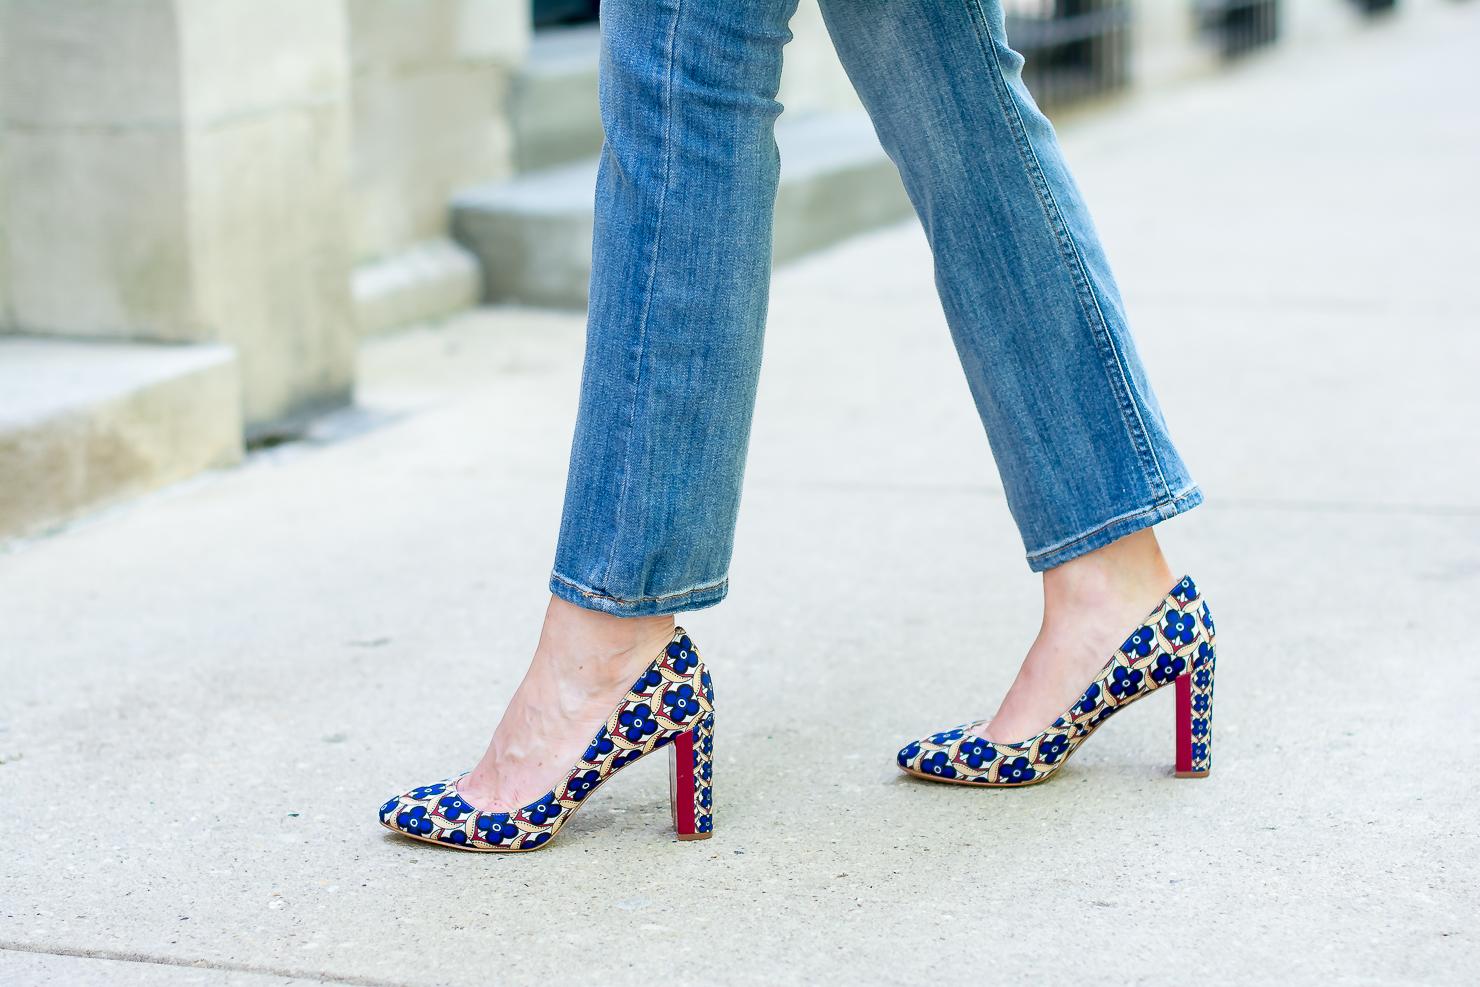 jcrew-cape-trench-dark-blue-chambray-hm-kick-flare-jeans-nine-west-printed-round-toe-pumps-zara-clutch-24